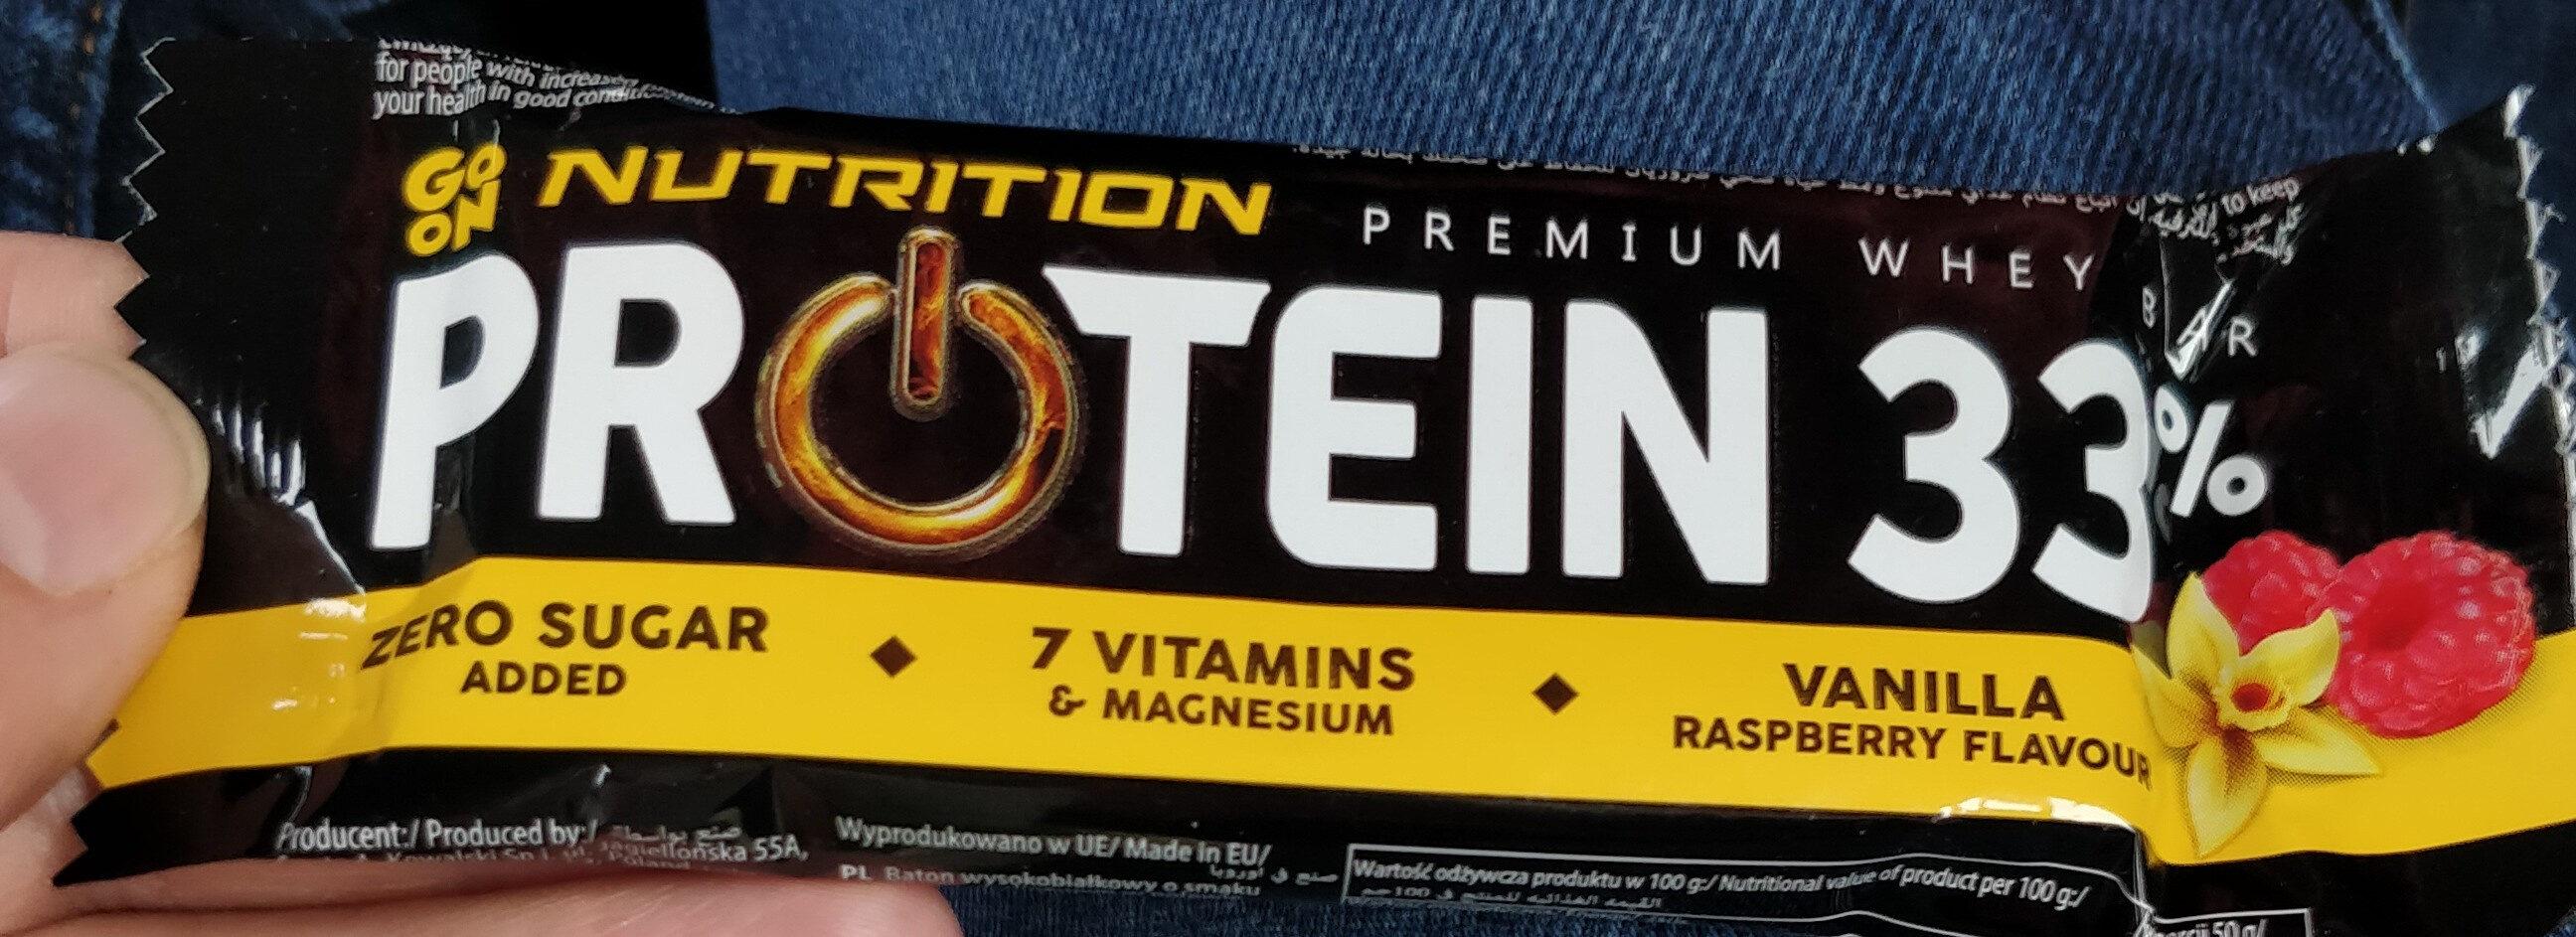 Baton proteinowy 33% wanilia malina - Produkt